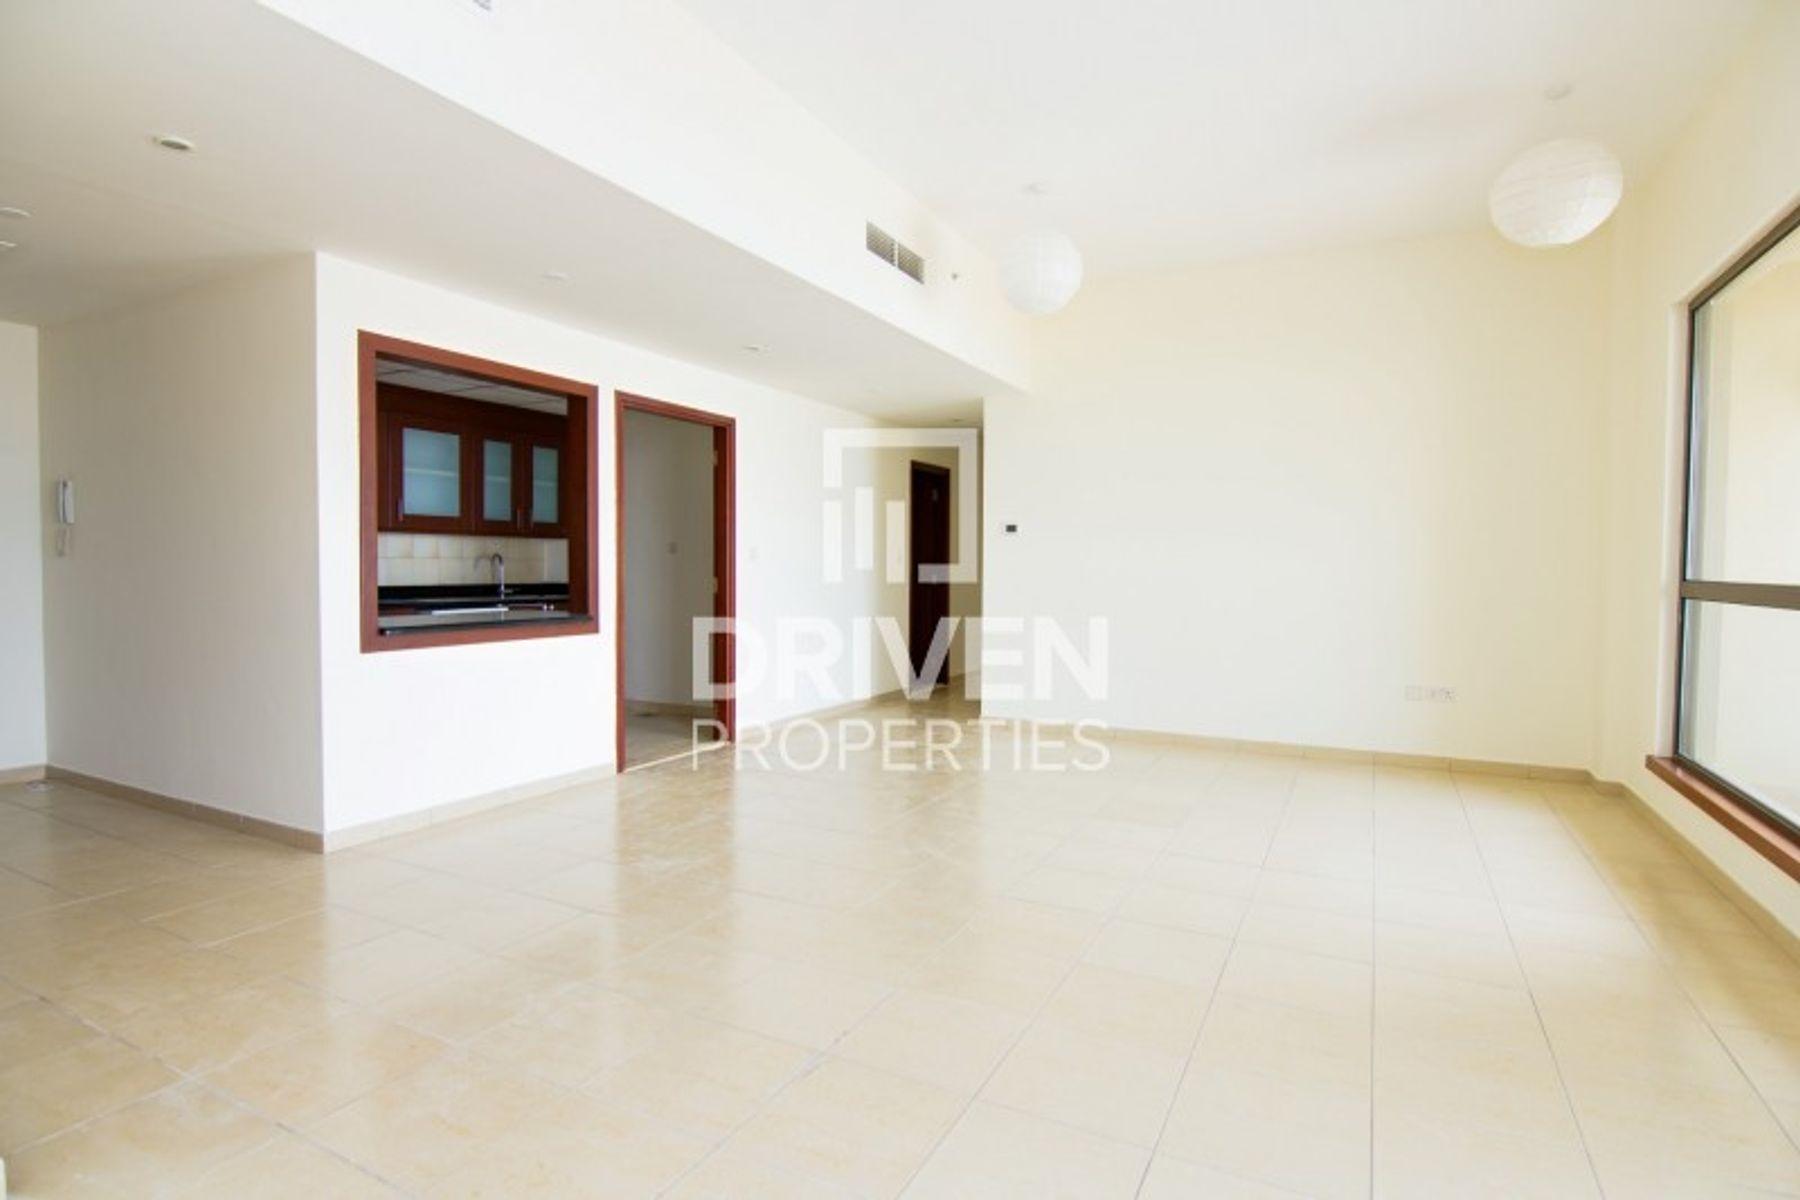 Apartment for Rent in Sadaf 5, Jumeirah Beach Residence